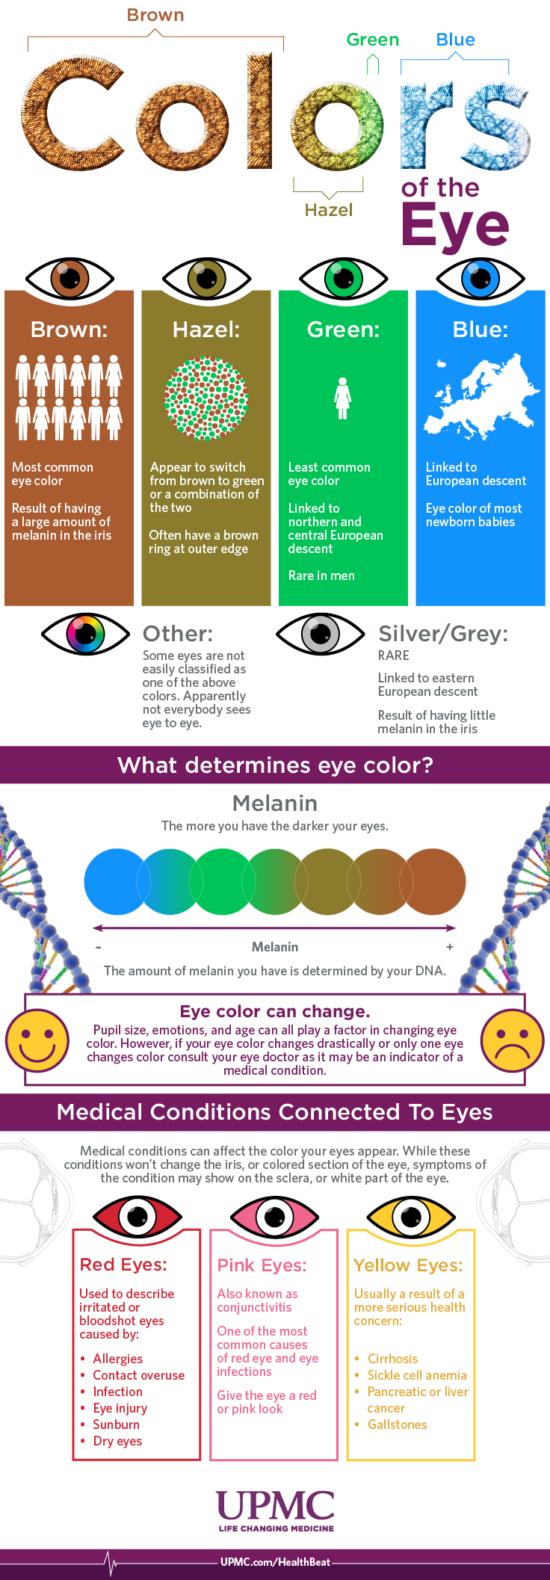 Co o vás prozradí vaše oči – Infografika